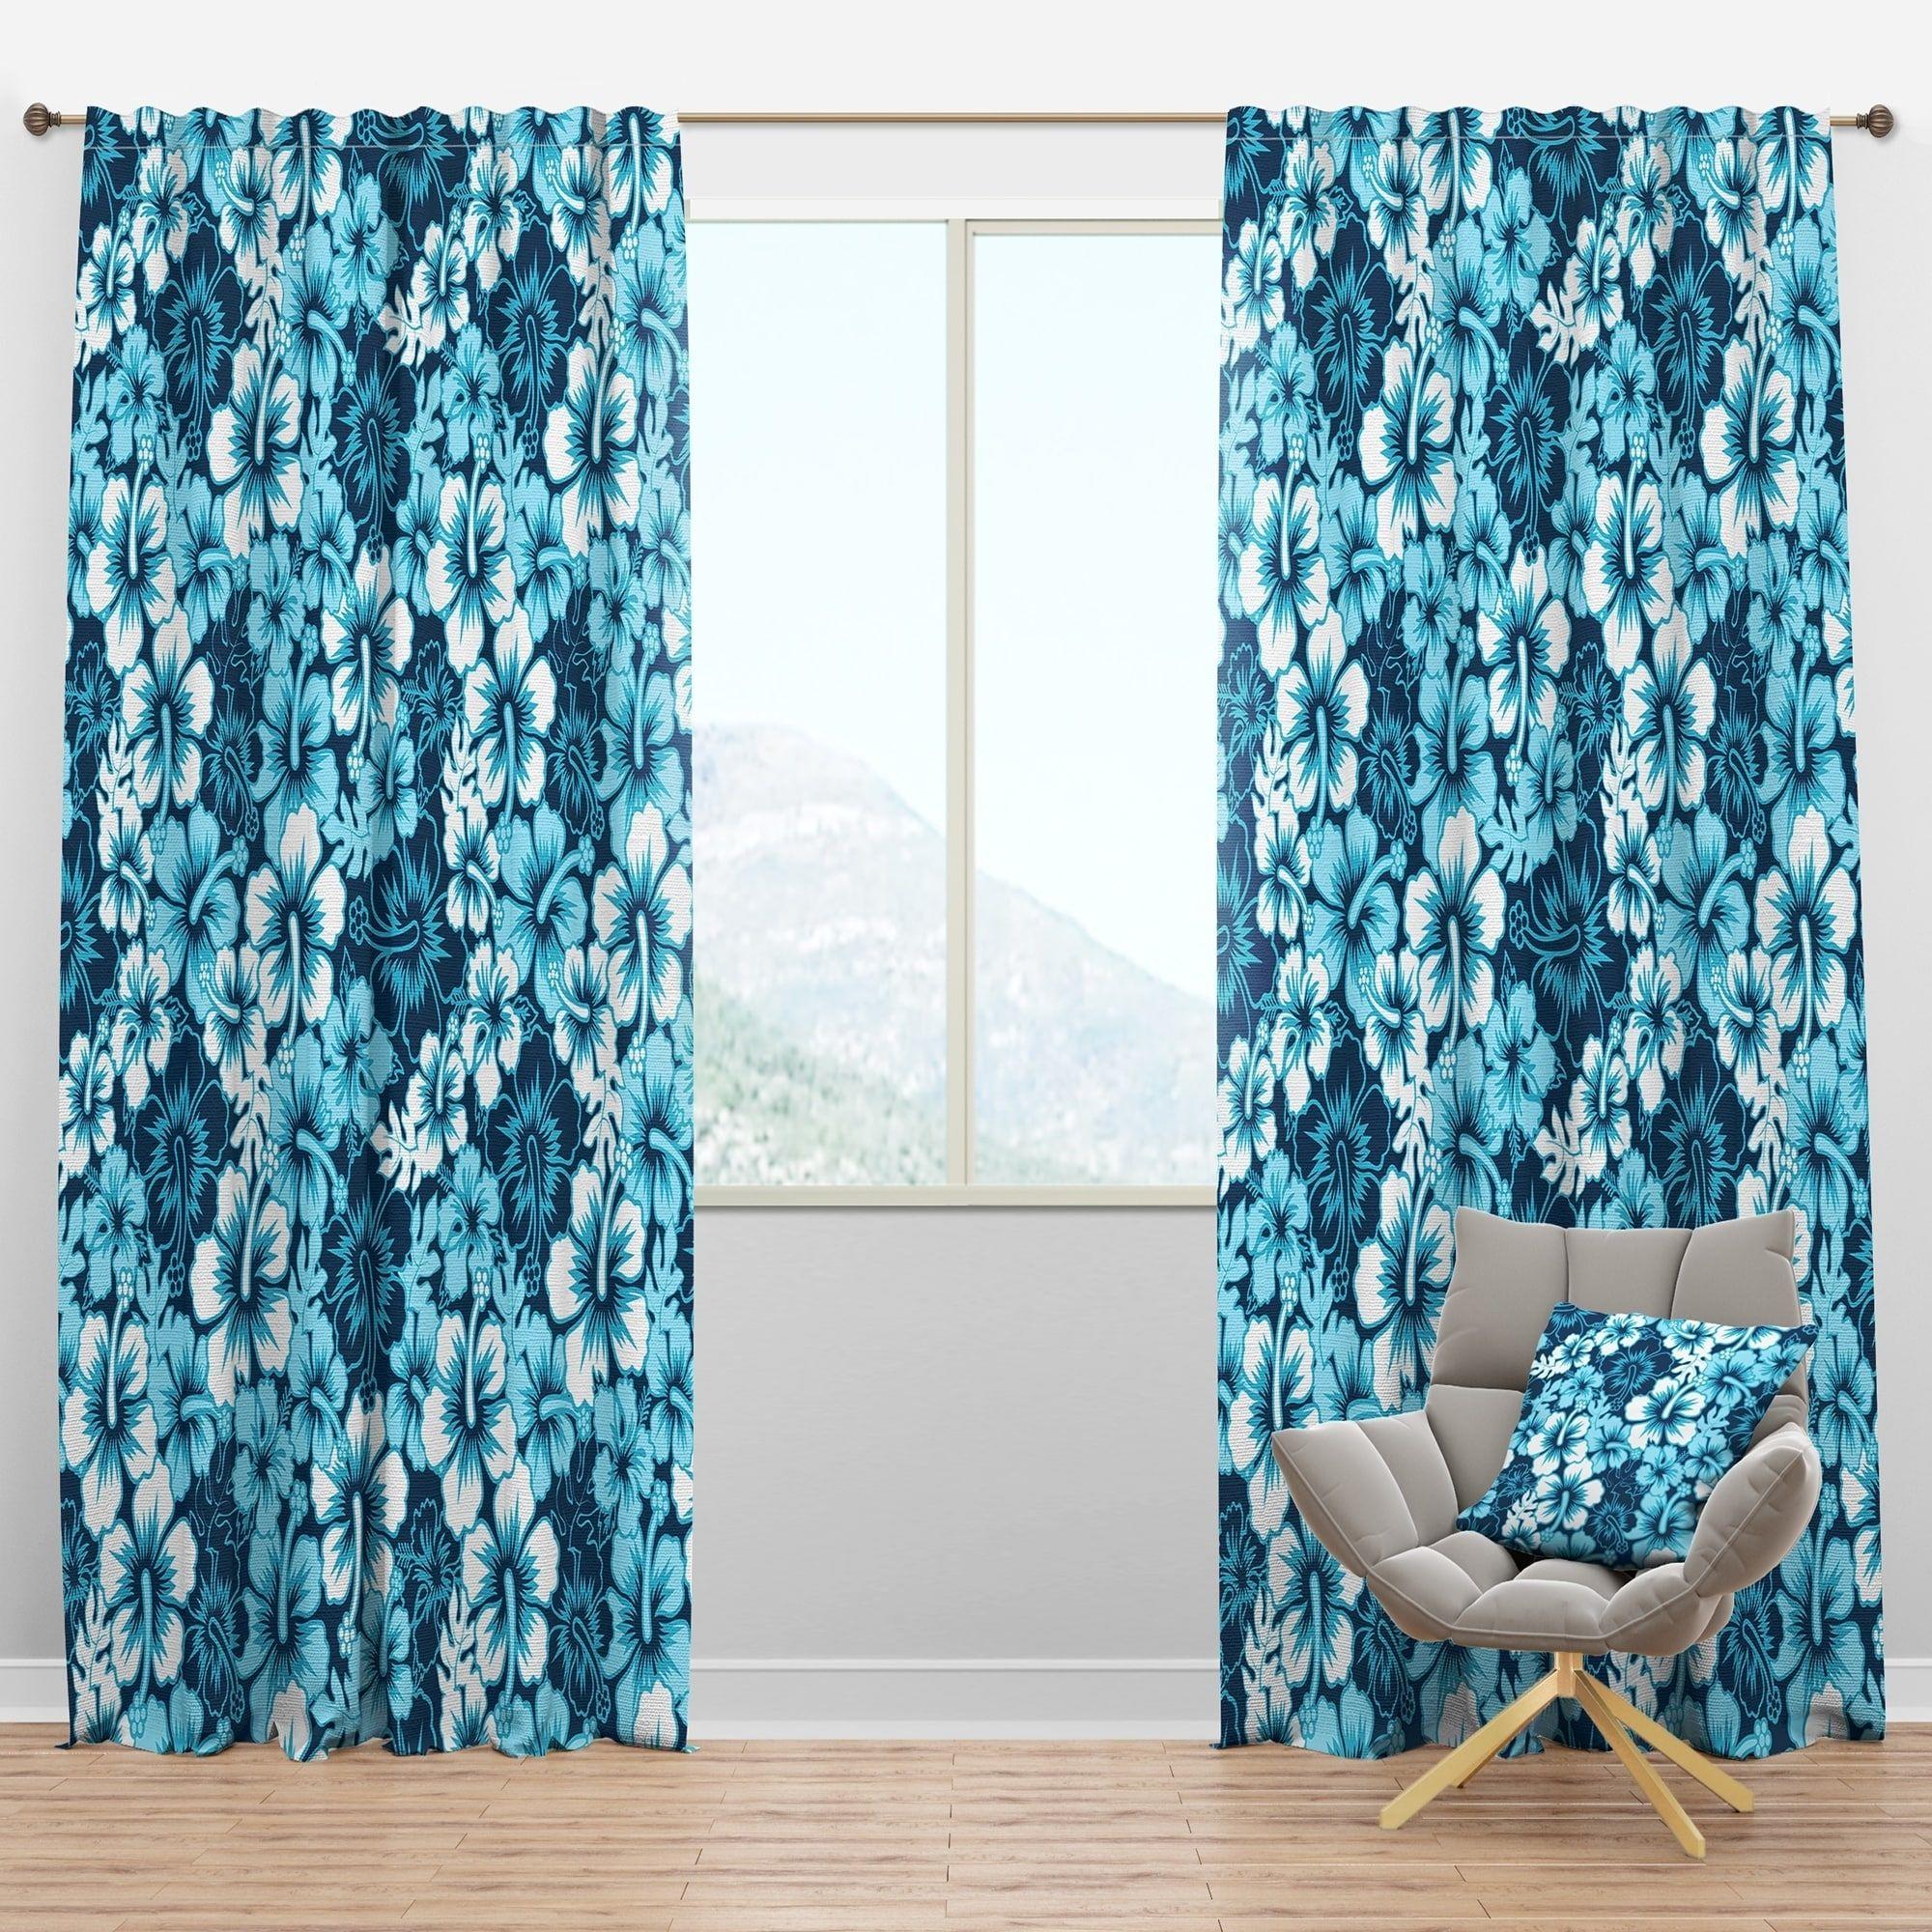 Designart Indigo Hawaii Flowers Pattern Tropical Curtain Panels